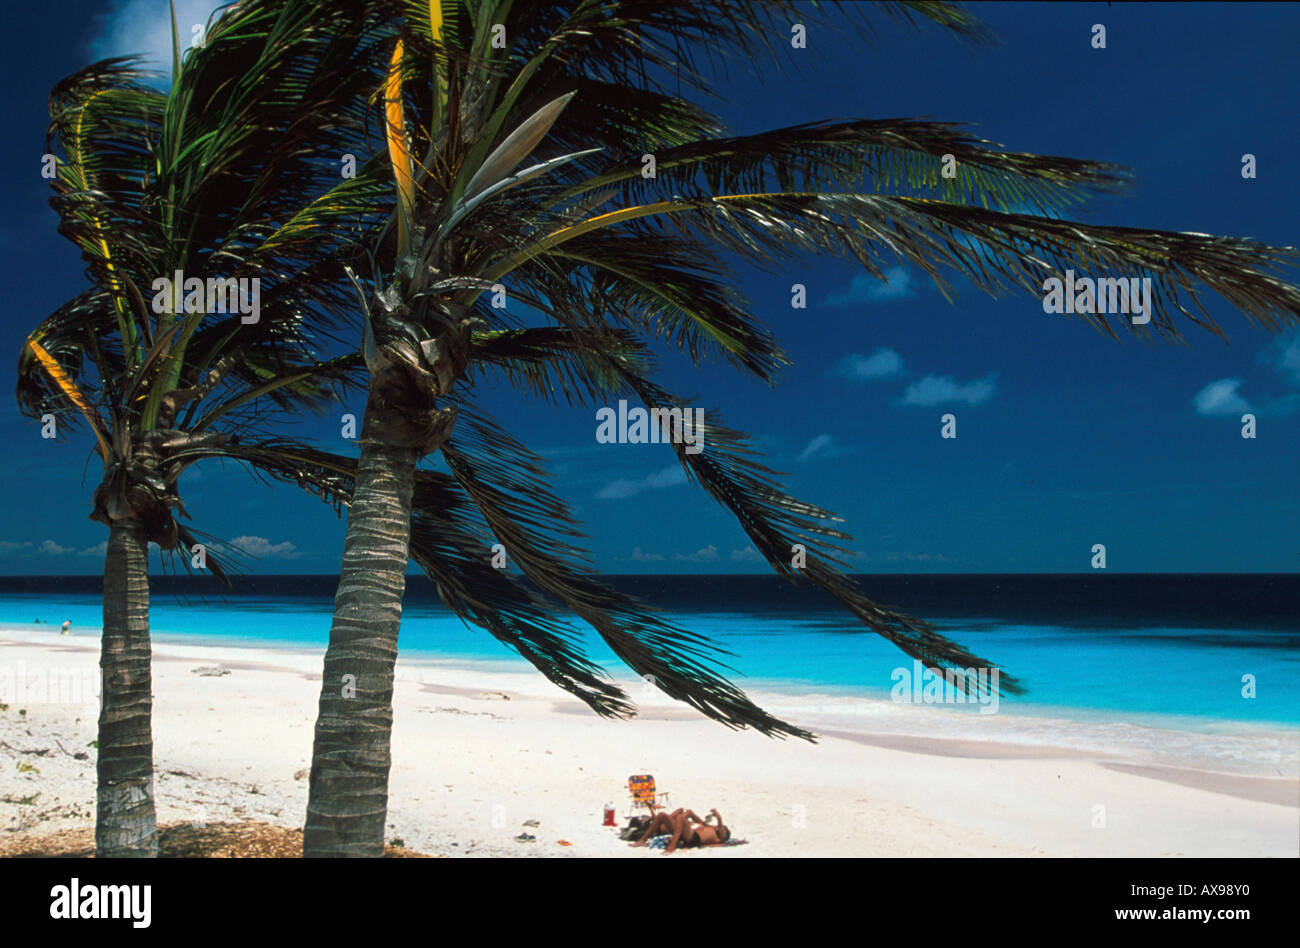 Pink Beach, Bonaire, Niederlaendische Karibik Antillen Banque D'Images